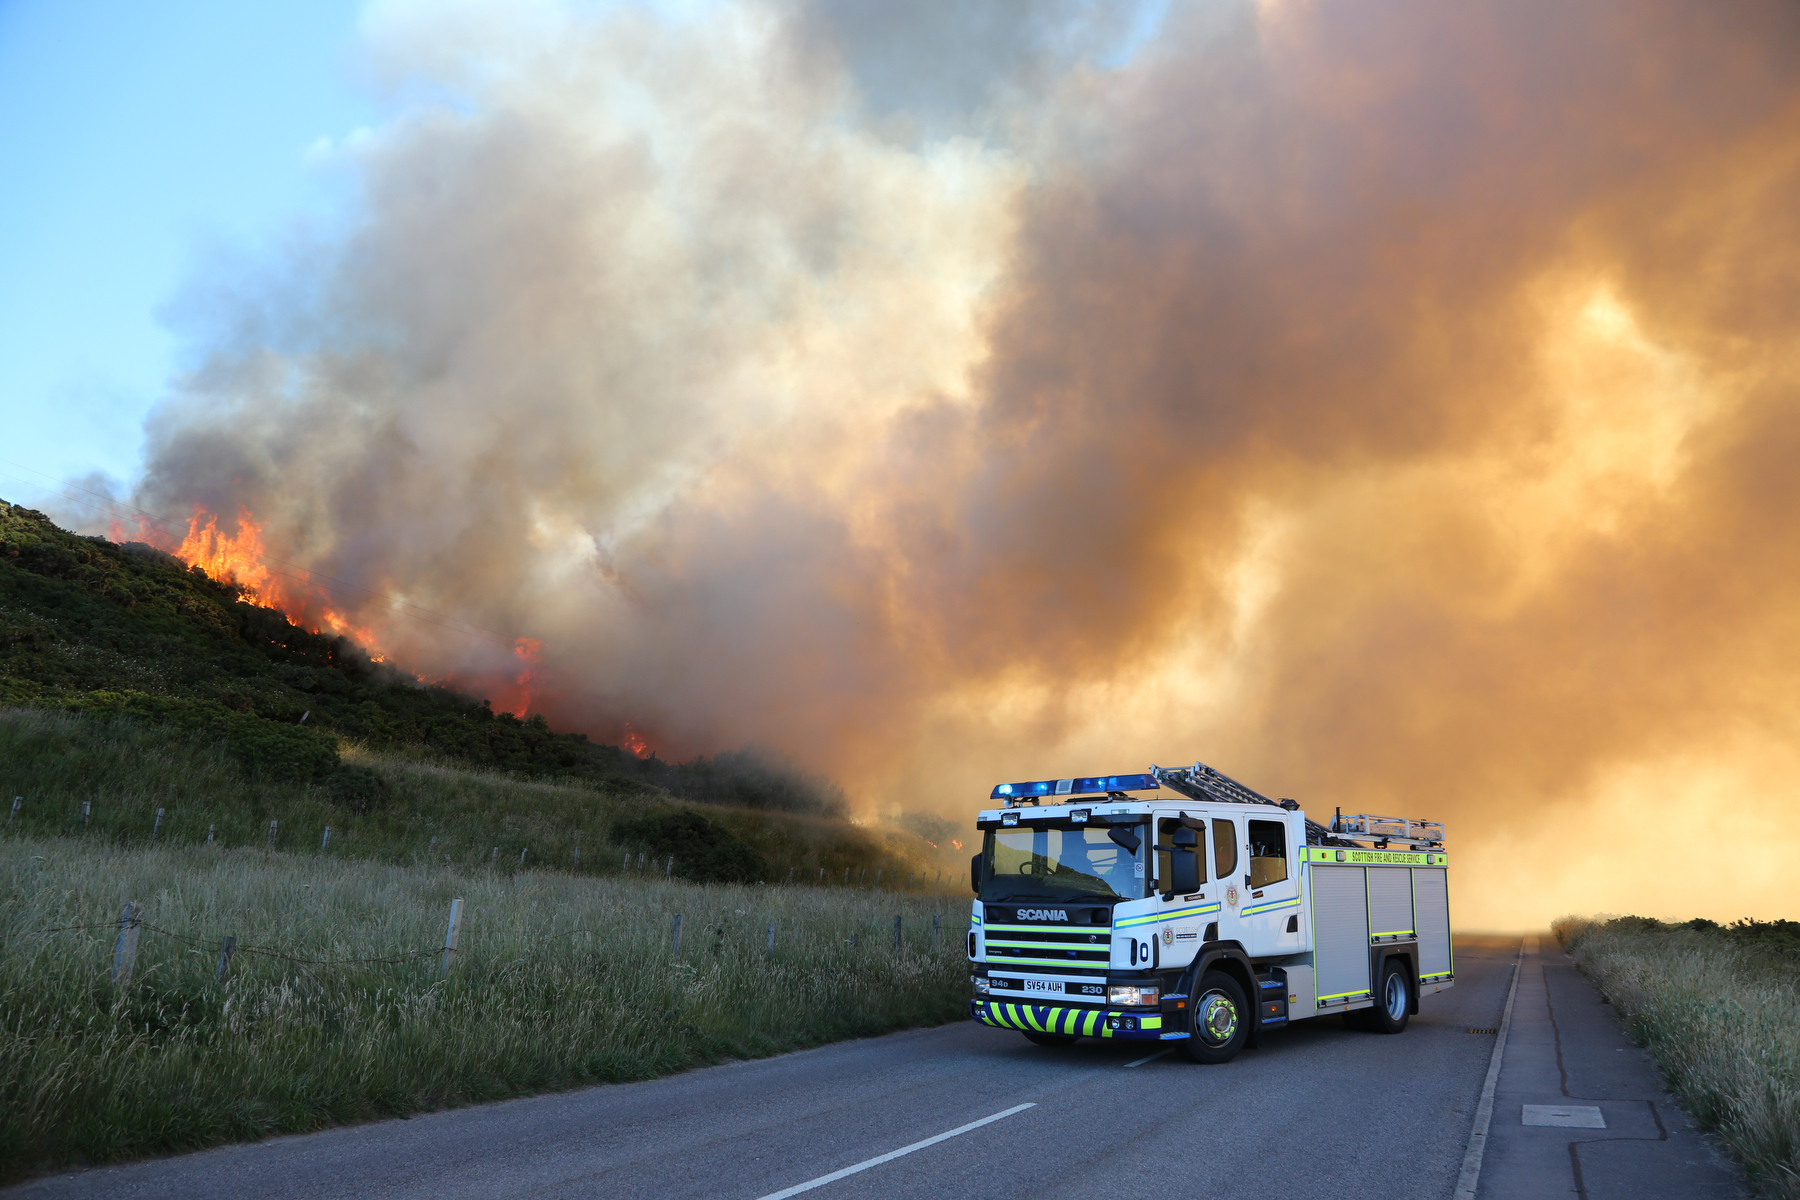 Gorse Fire in Buckie (Douglas S Coull)